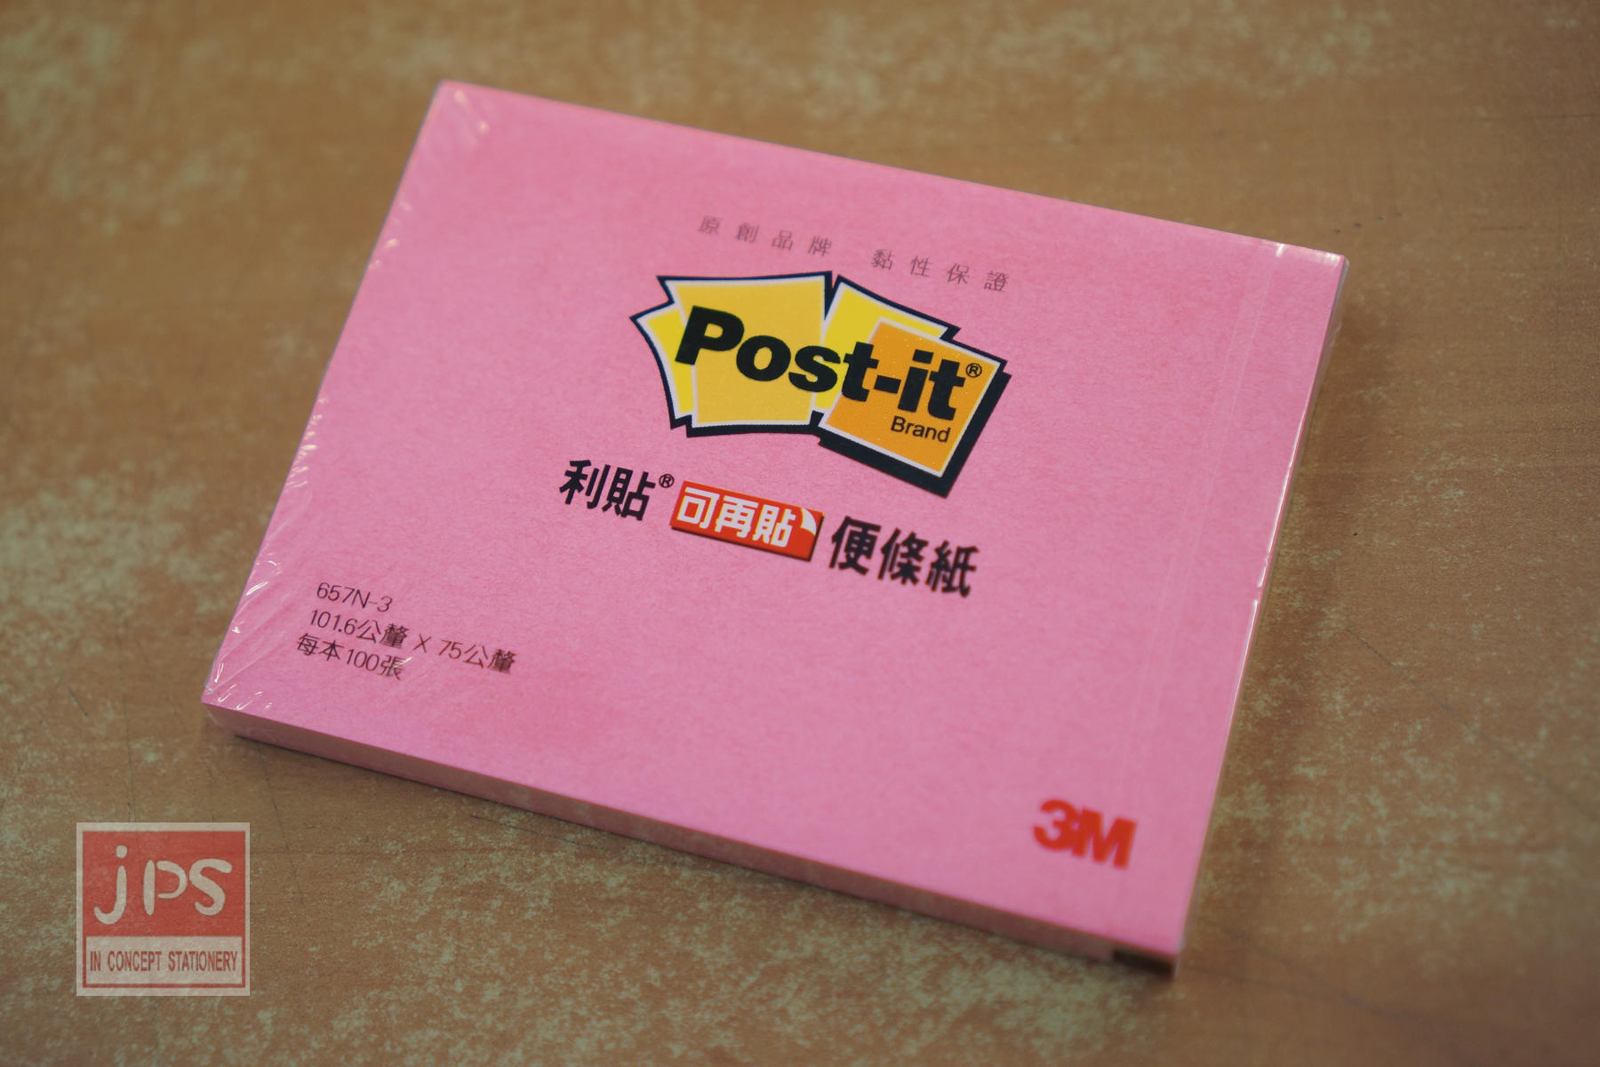 3M Post-it 利貼 可再貼 便條紙 便利貼 螢光粉 657N-3